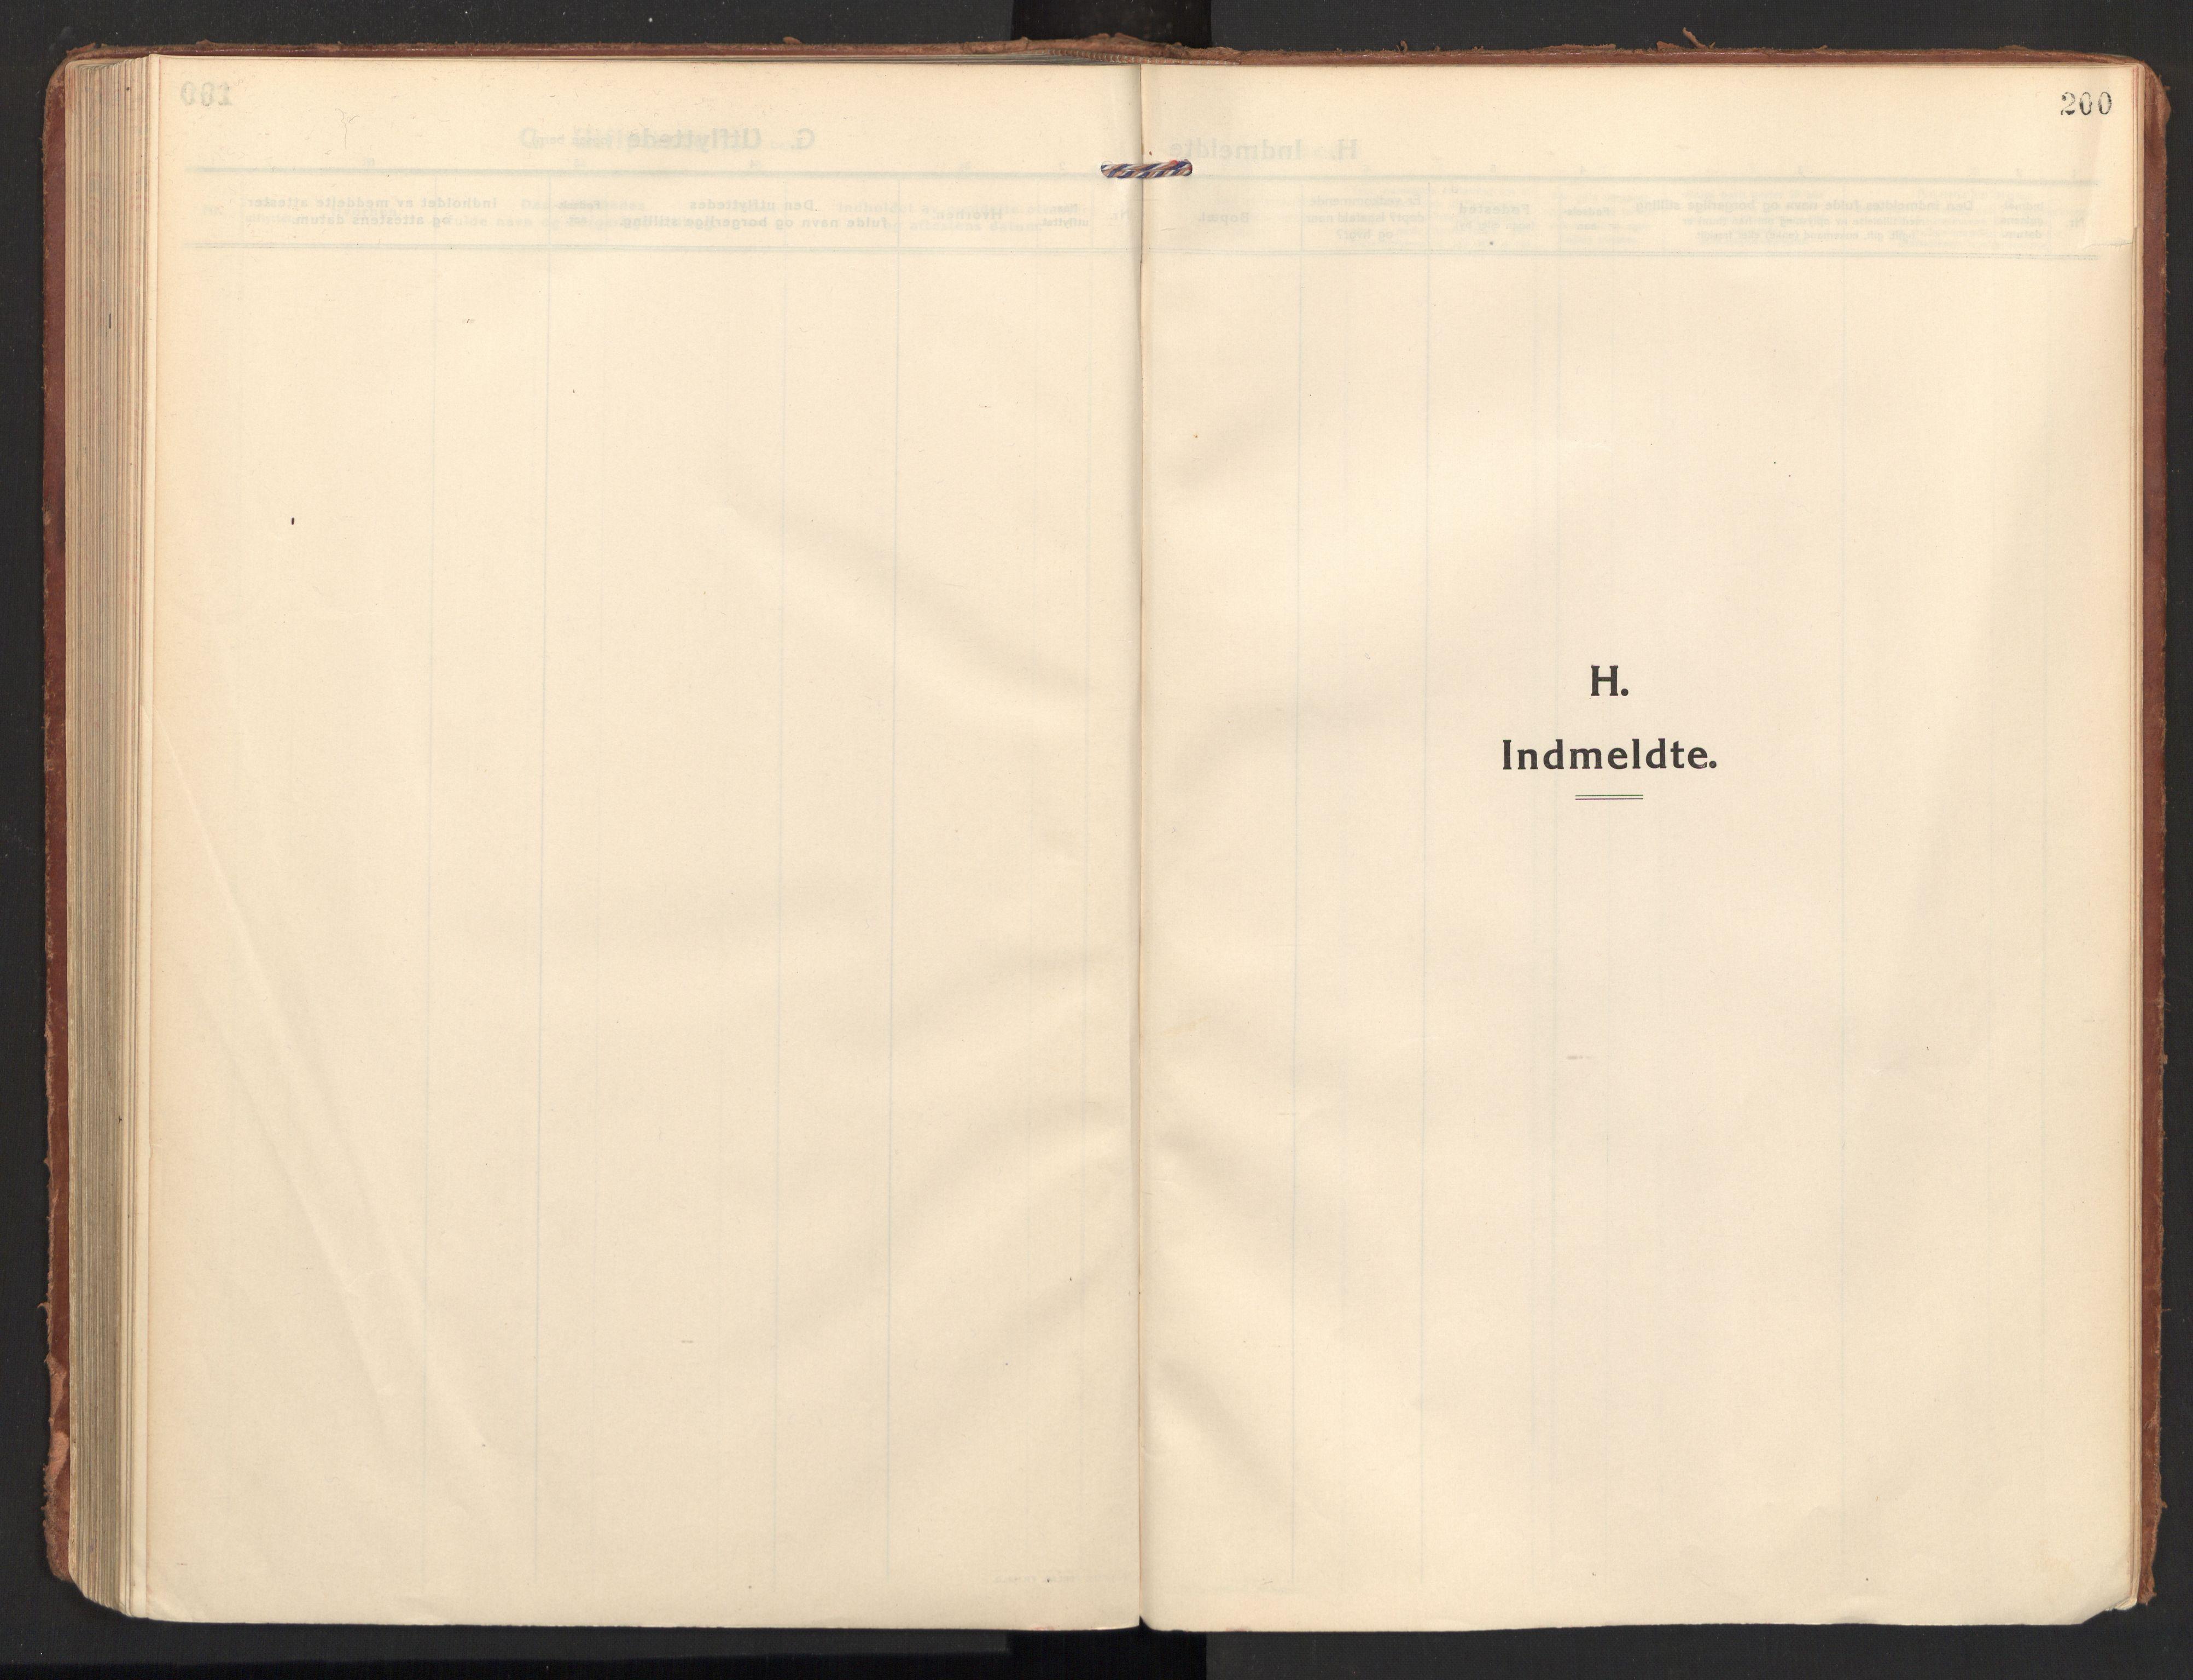 SAT, Ministerialprotokoller, klokkerbøker og fødselsregistre - Nordland, 810/L0156: Ministerialbok nr. 810A15, 1915-1930, s. 200